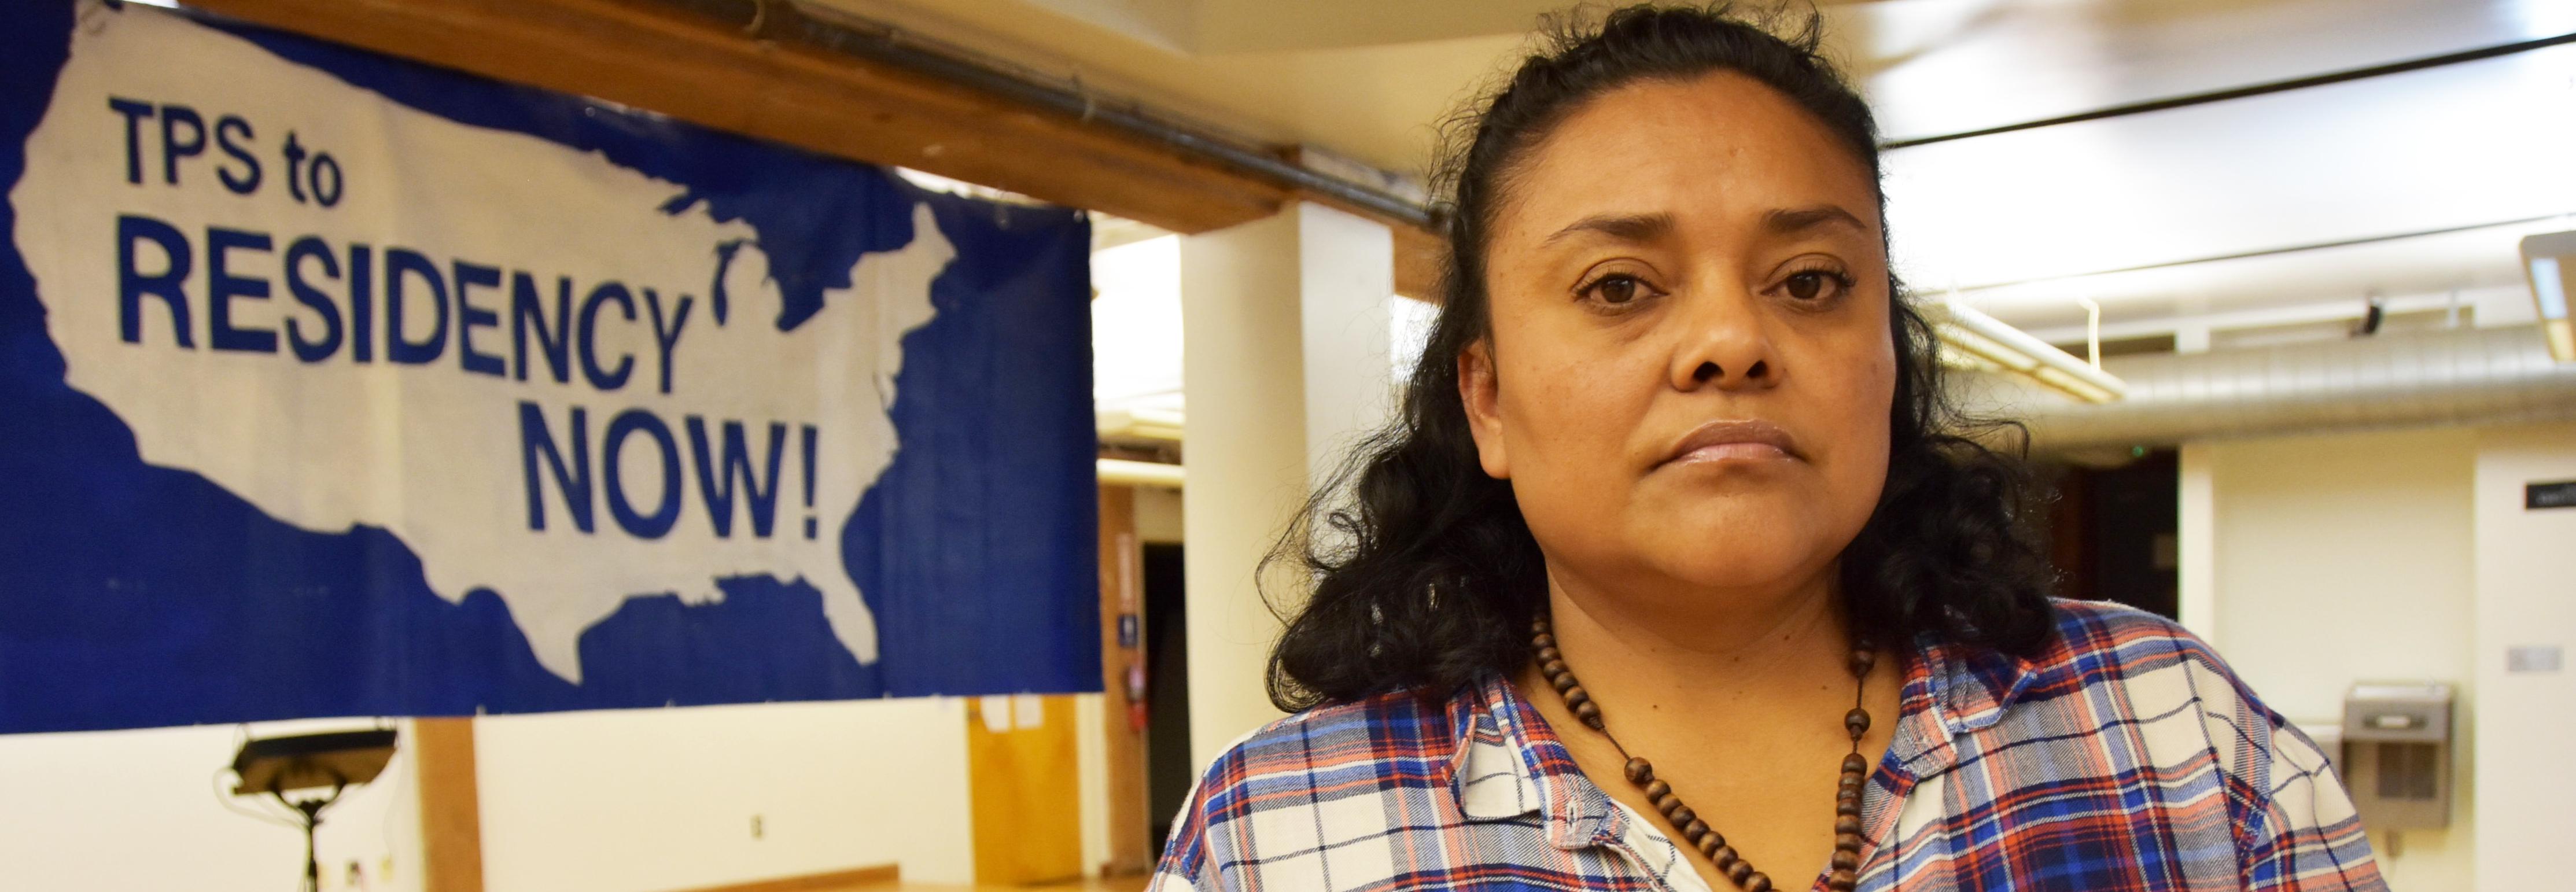 No more TPS for Nicaraguans